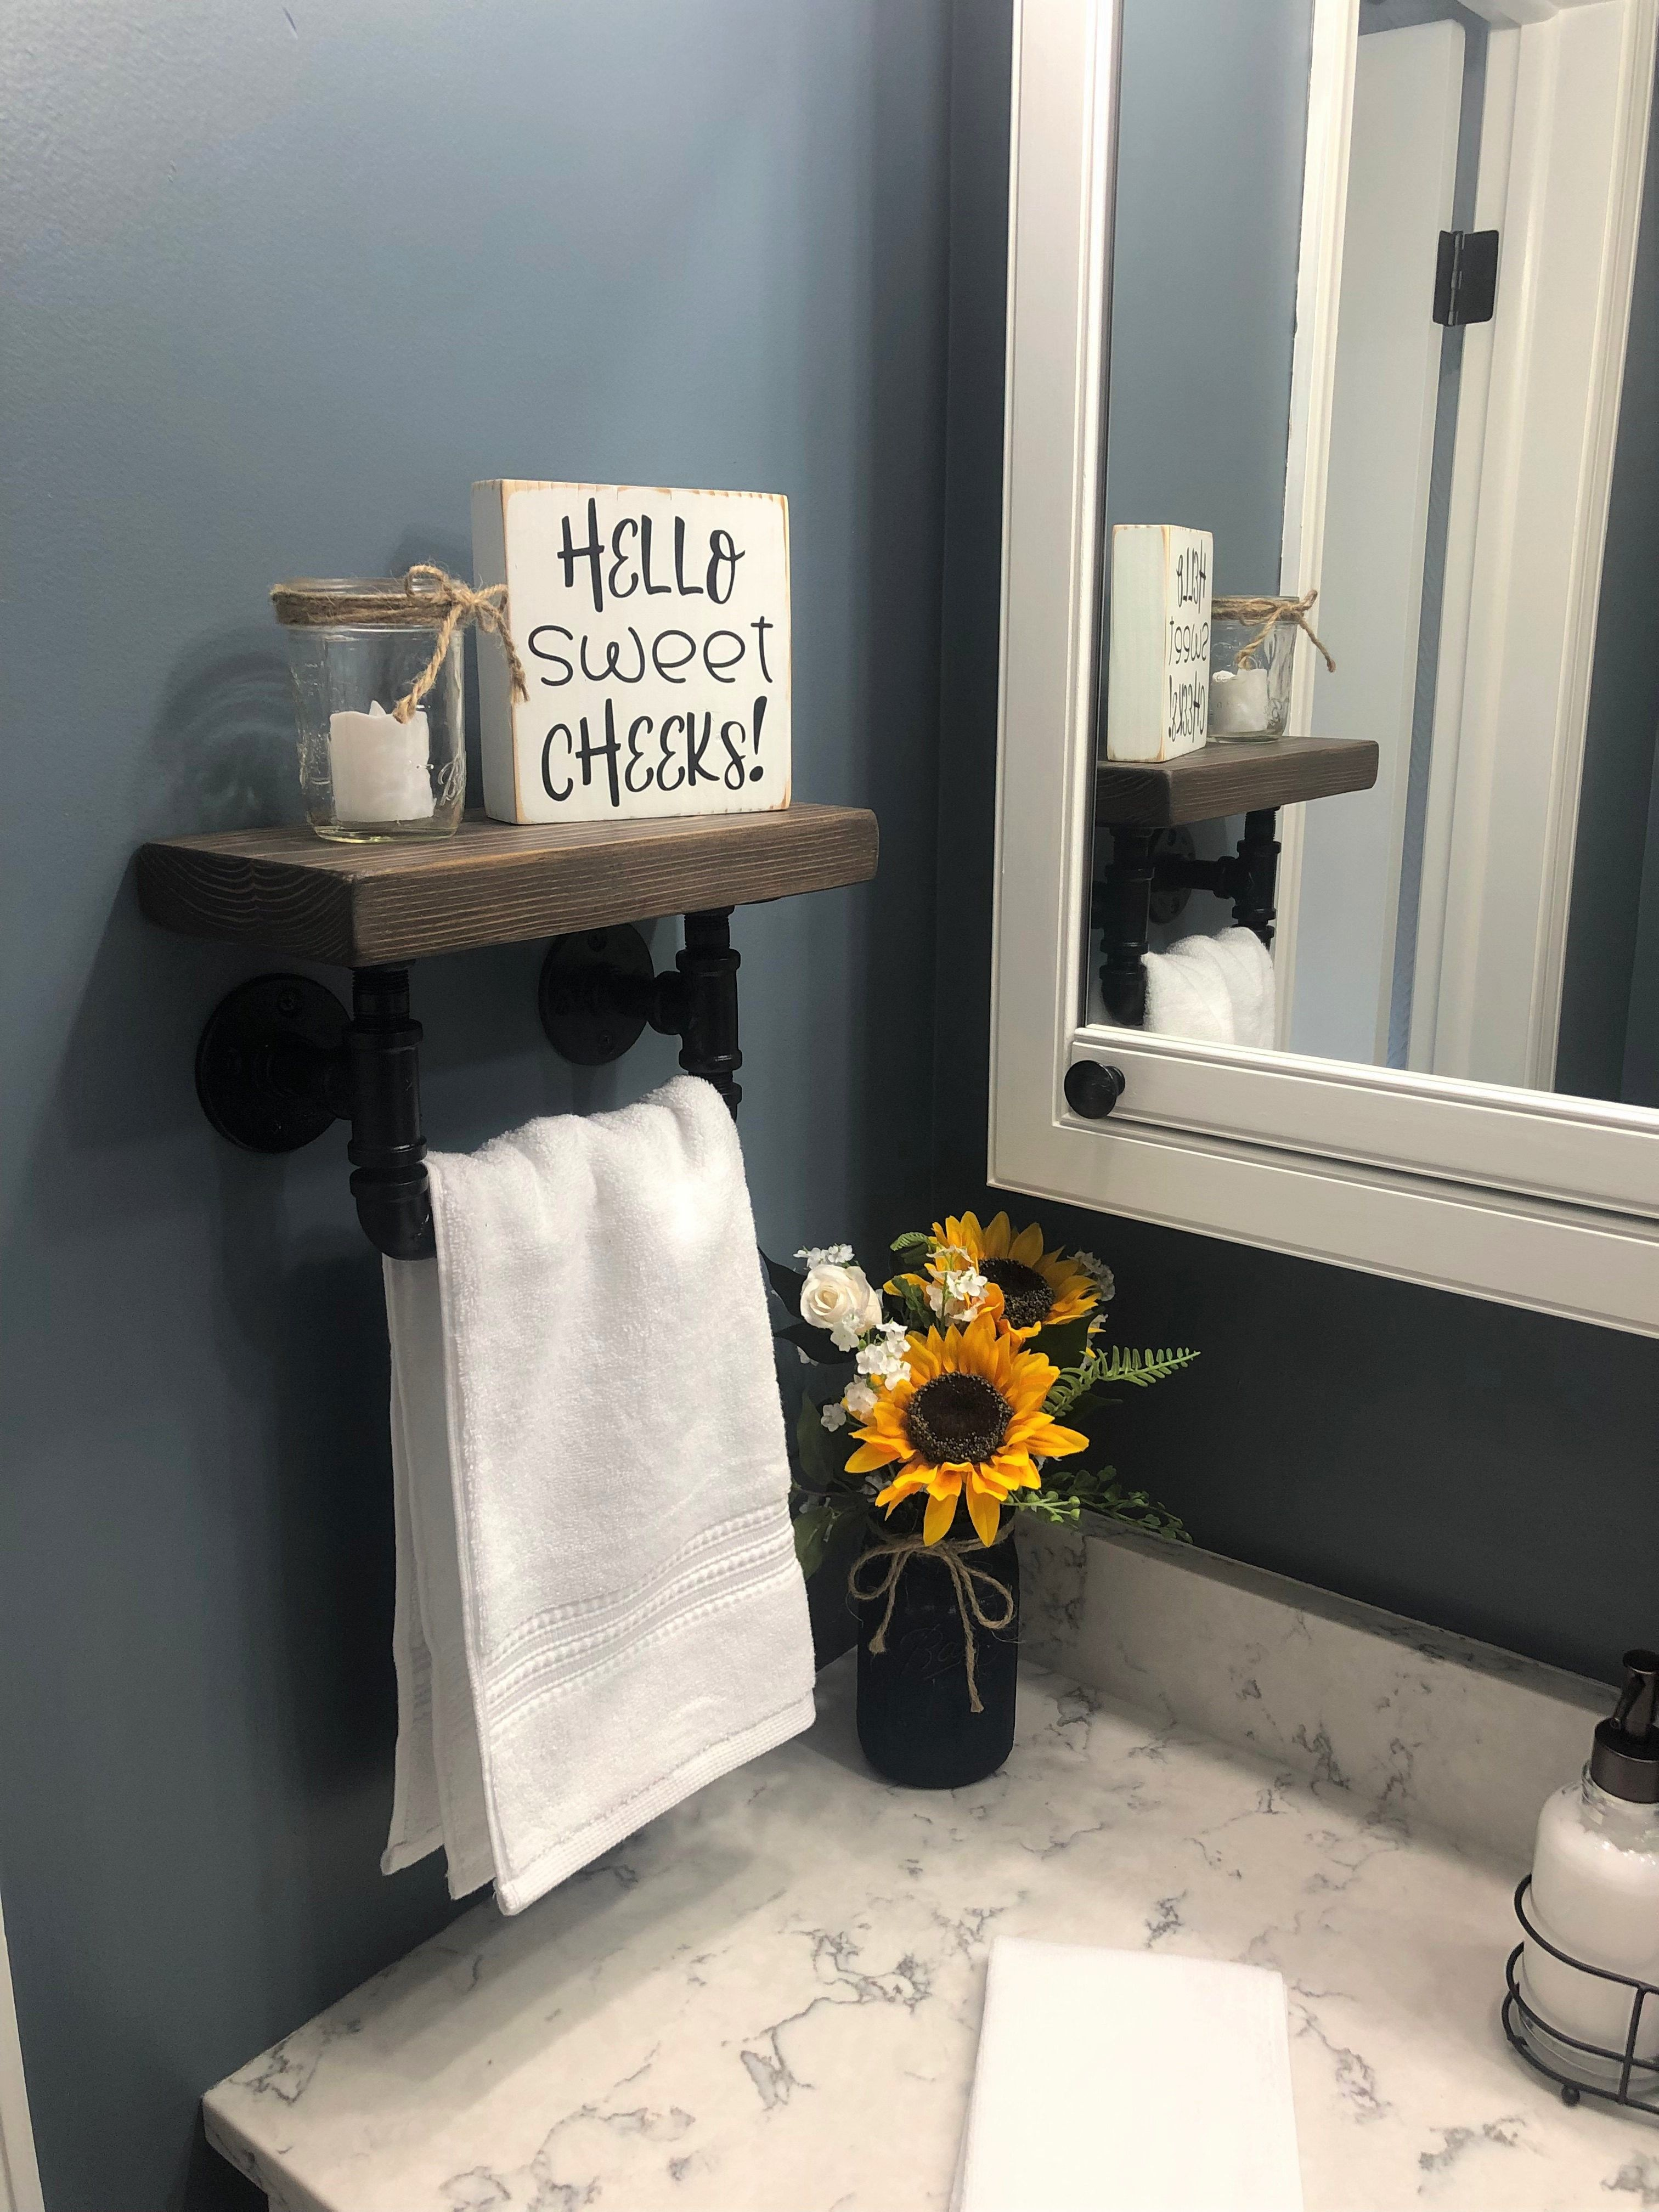 Farmhouse Bathroom Floating Shelf with Hand Towel Bar Rustic Design Handcrafted Restroom Decor